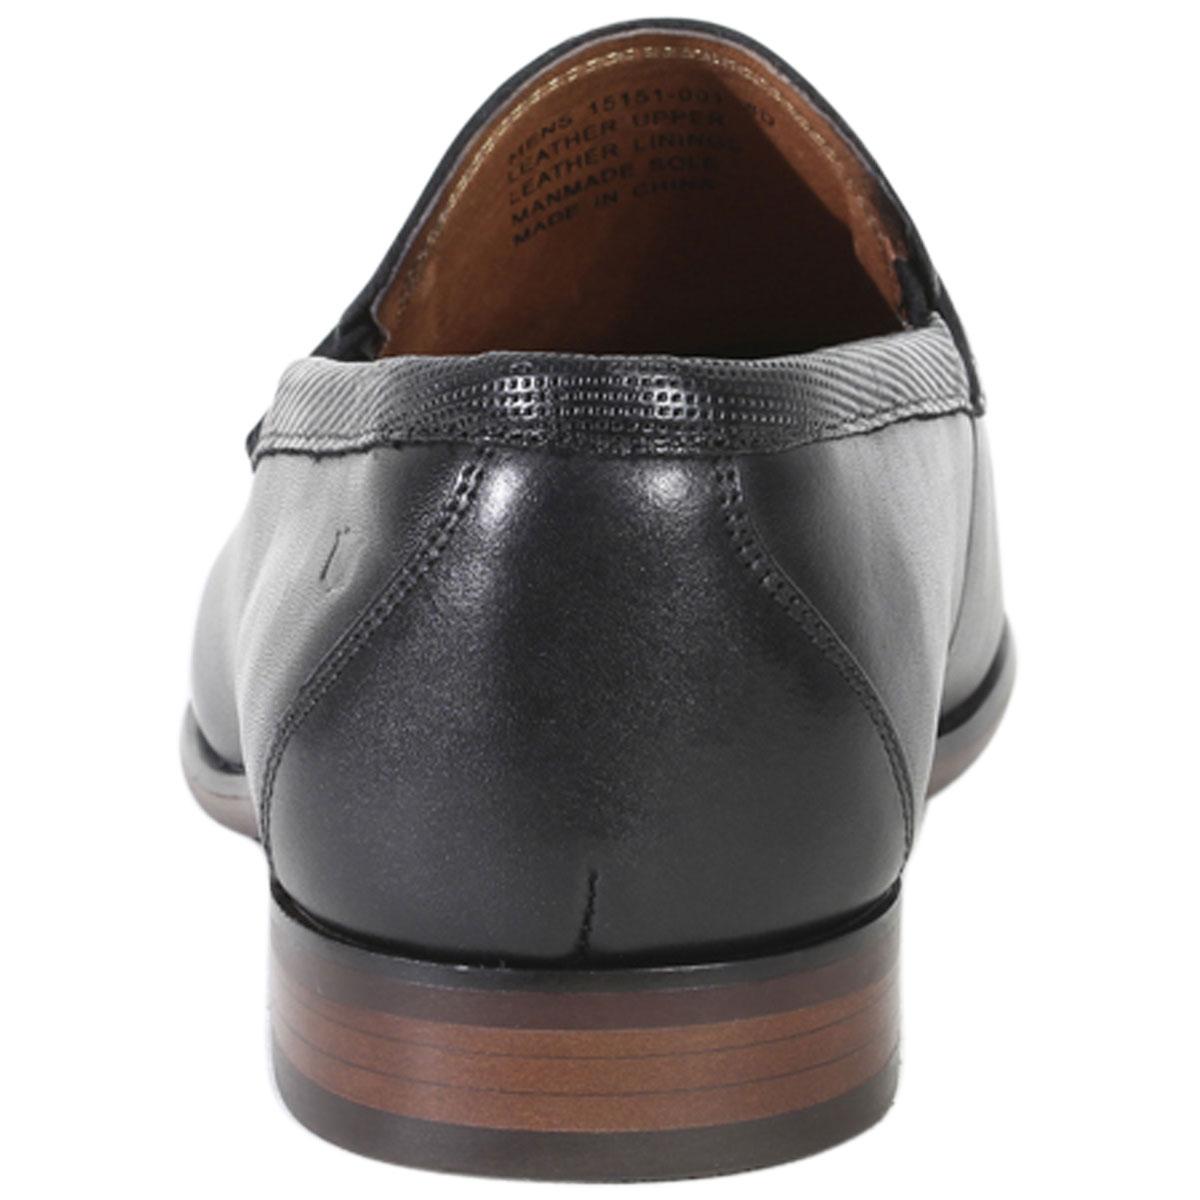 Florsheim-Men-039-s-Postino-Penny-Loafers-Shoes thumbnail 11